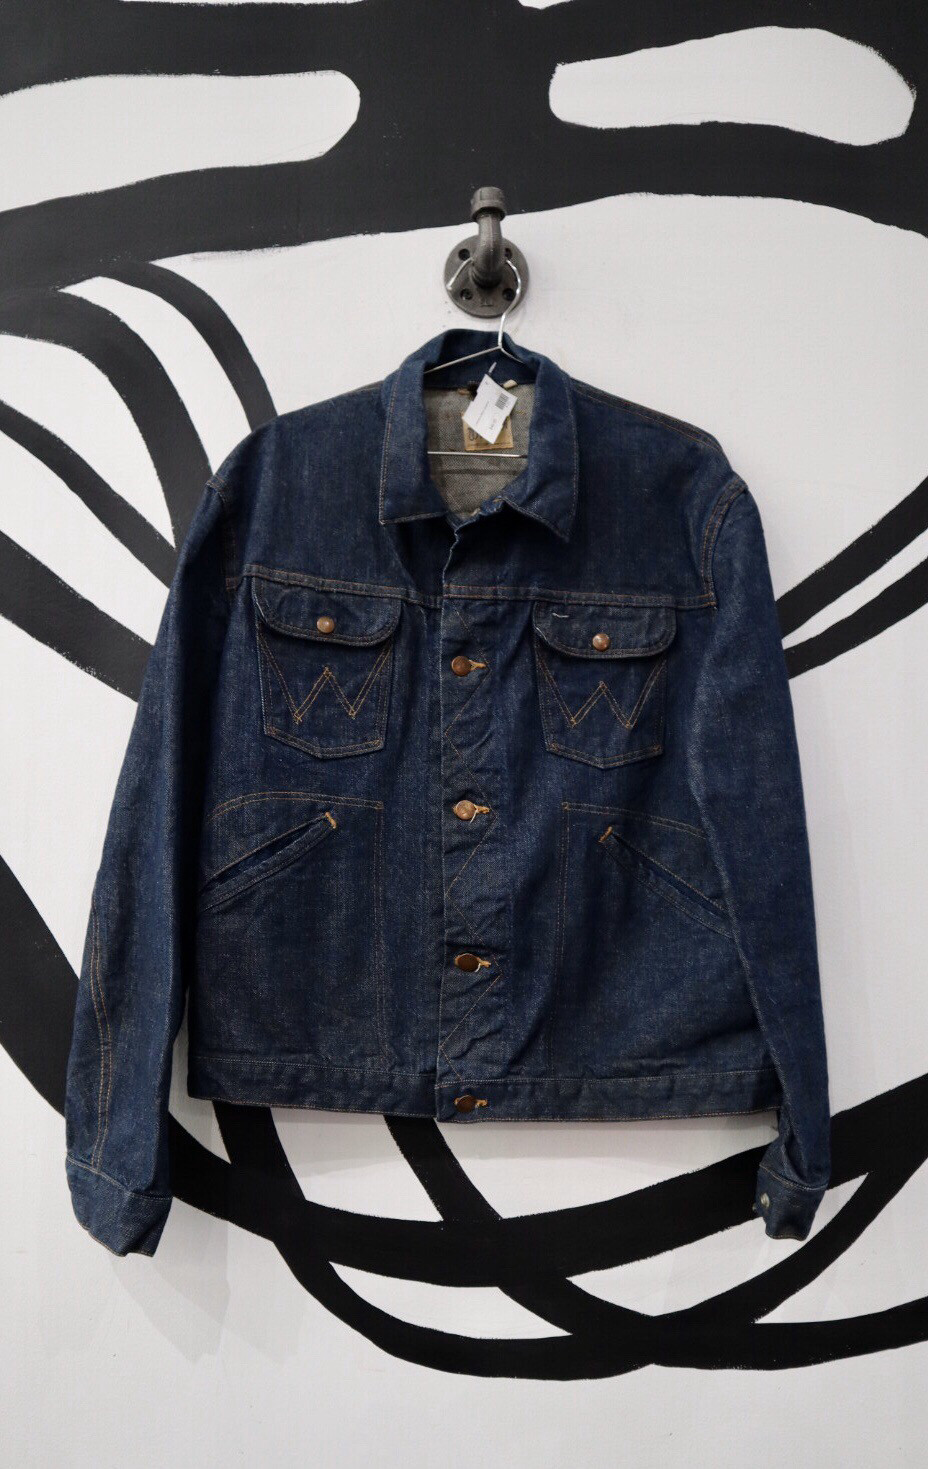 Vintage Wrangler Jacket - Size 44